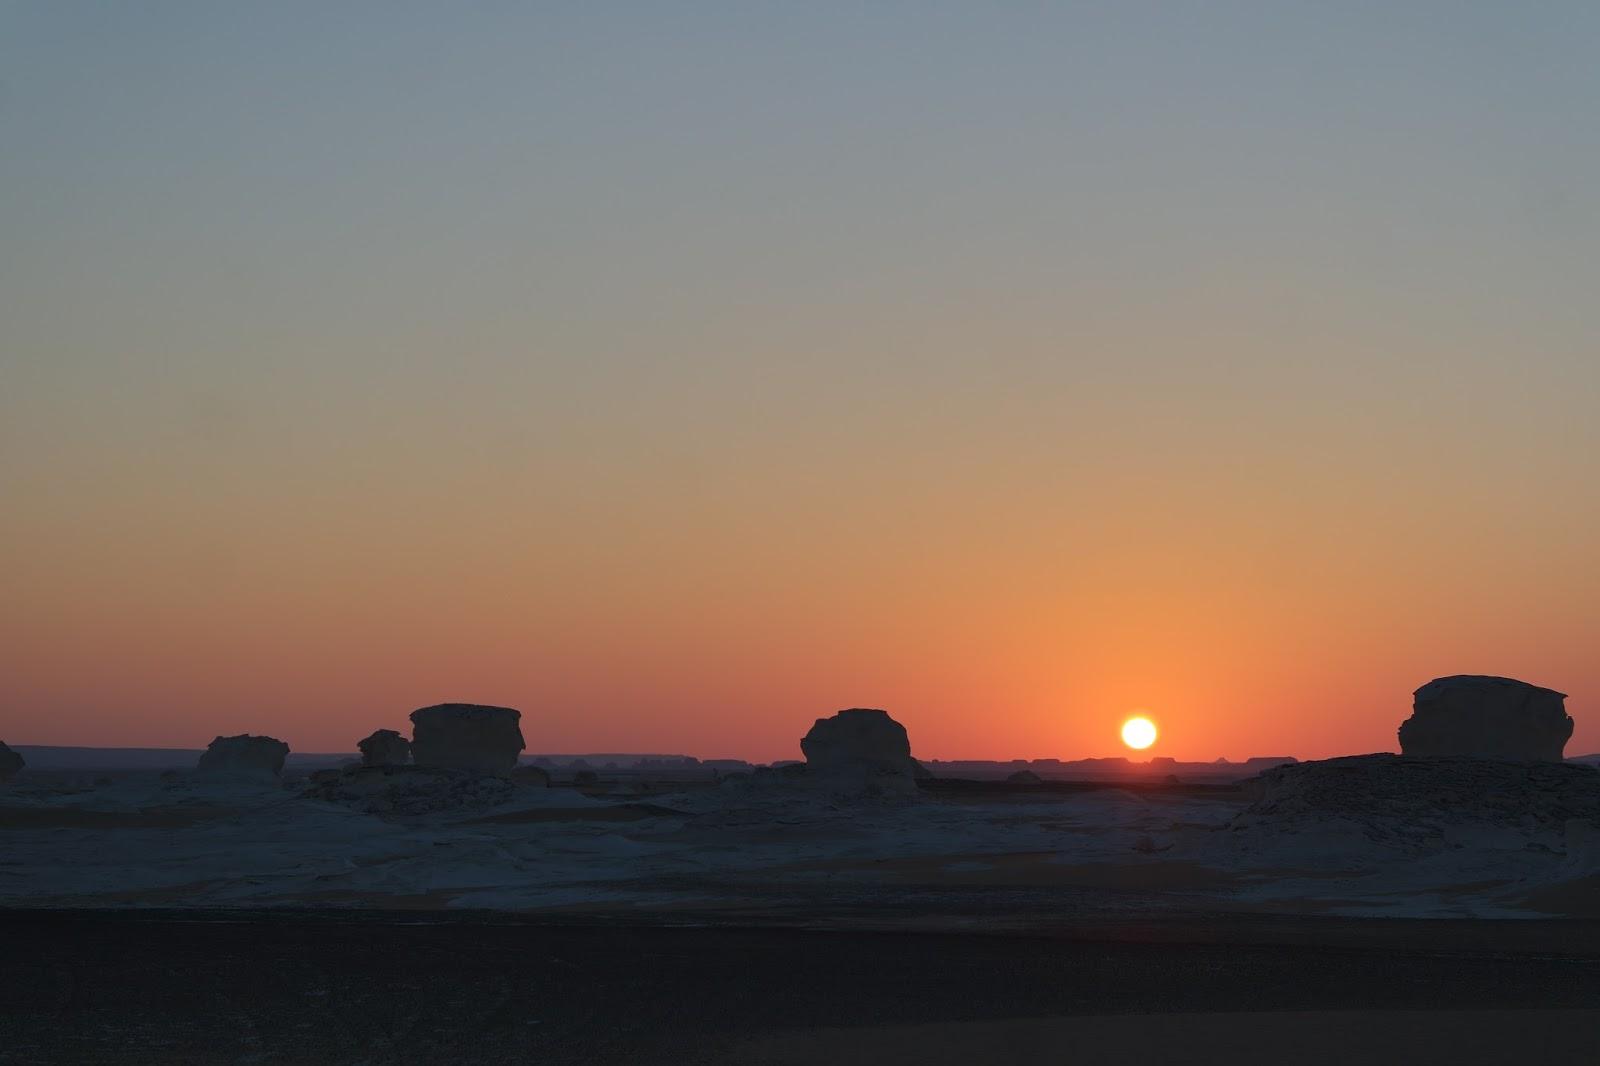 Pôr do sol no Deserto Branco saara